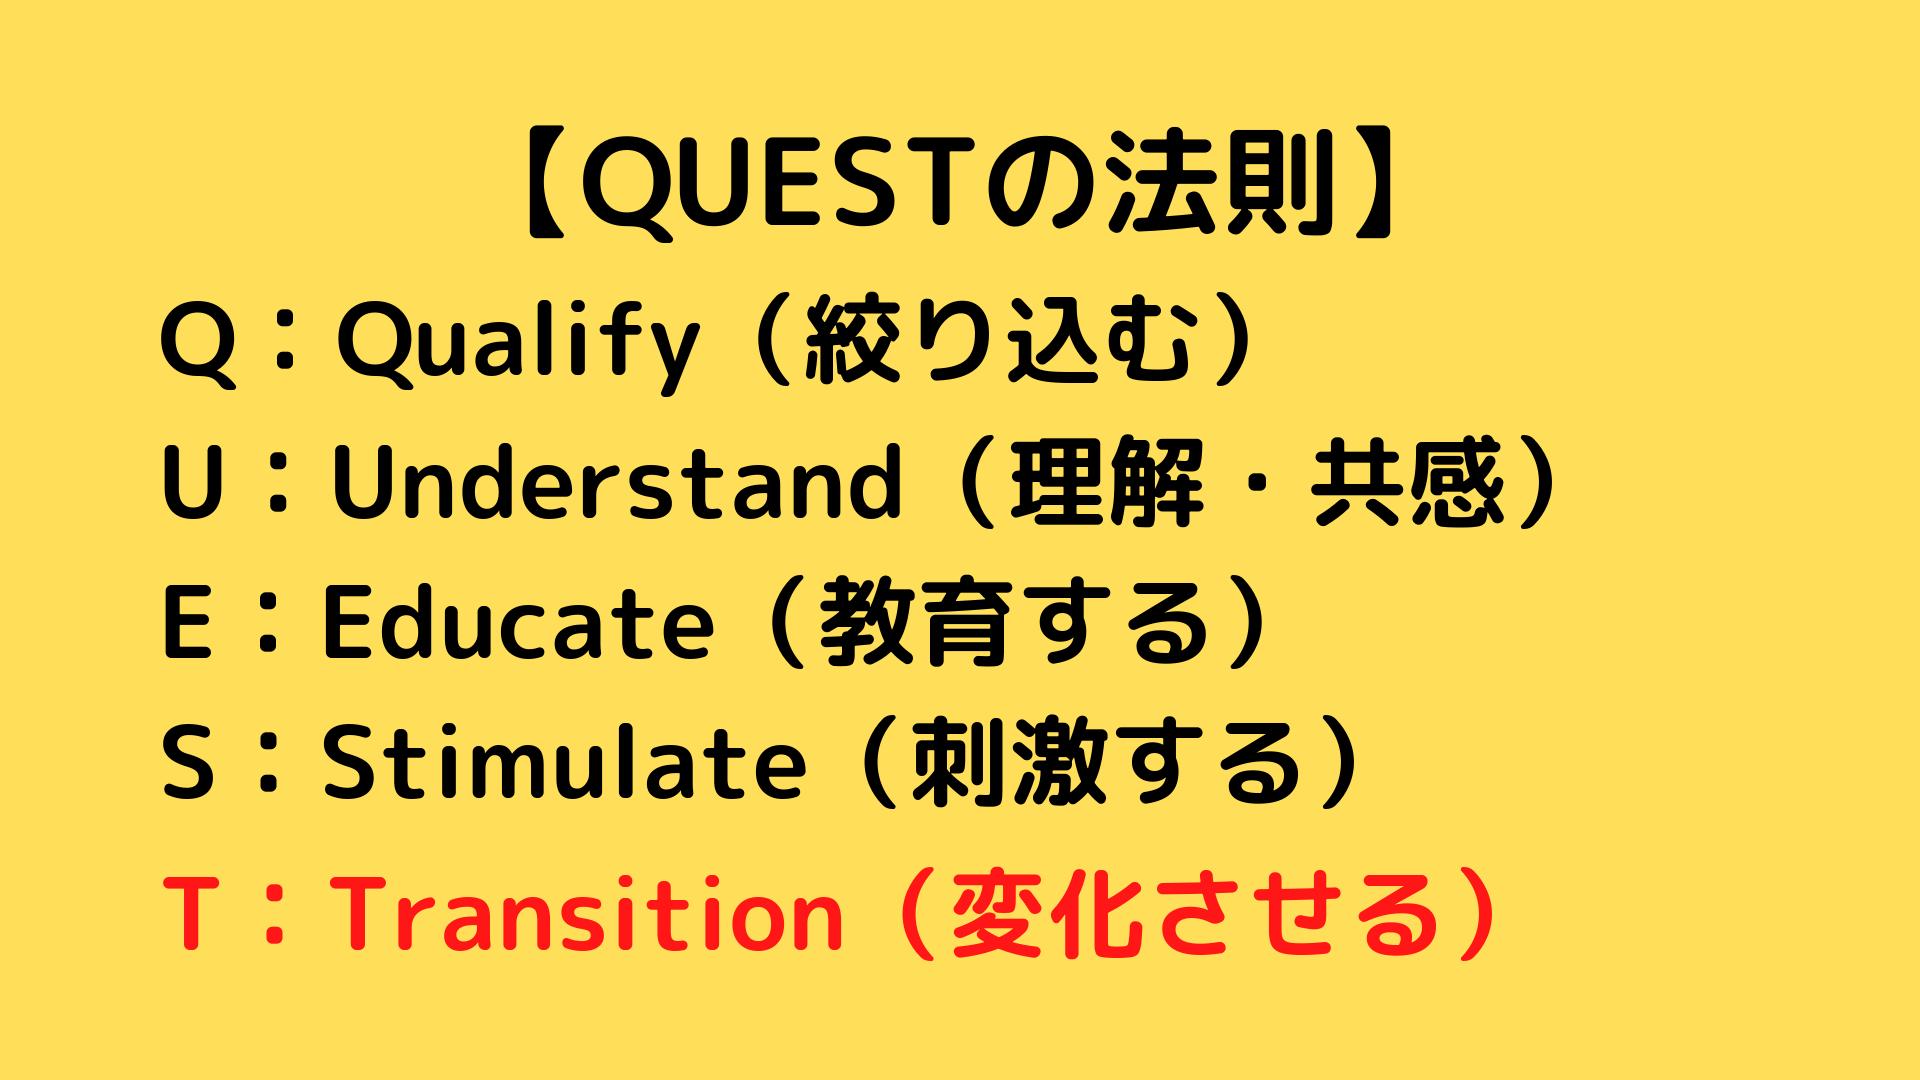 QUESTの法則 QUESTフォーミュラ 6